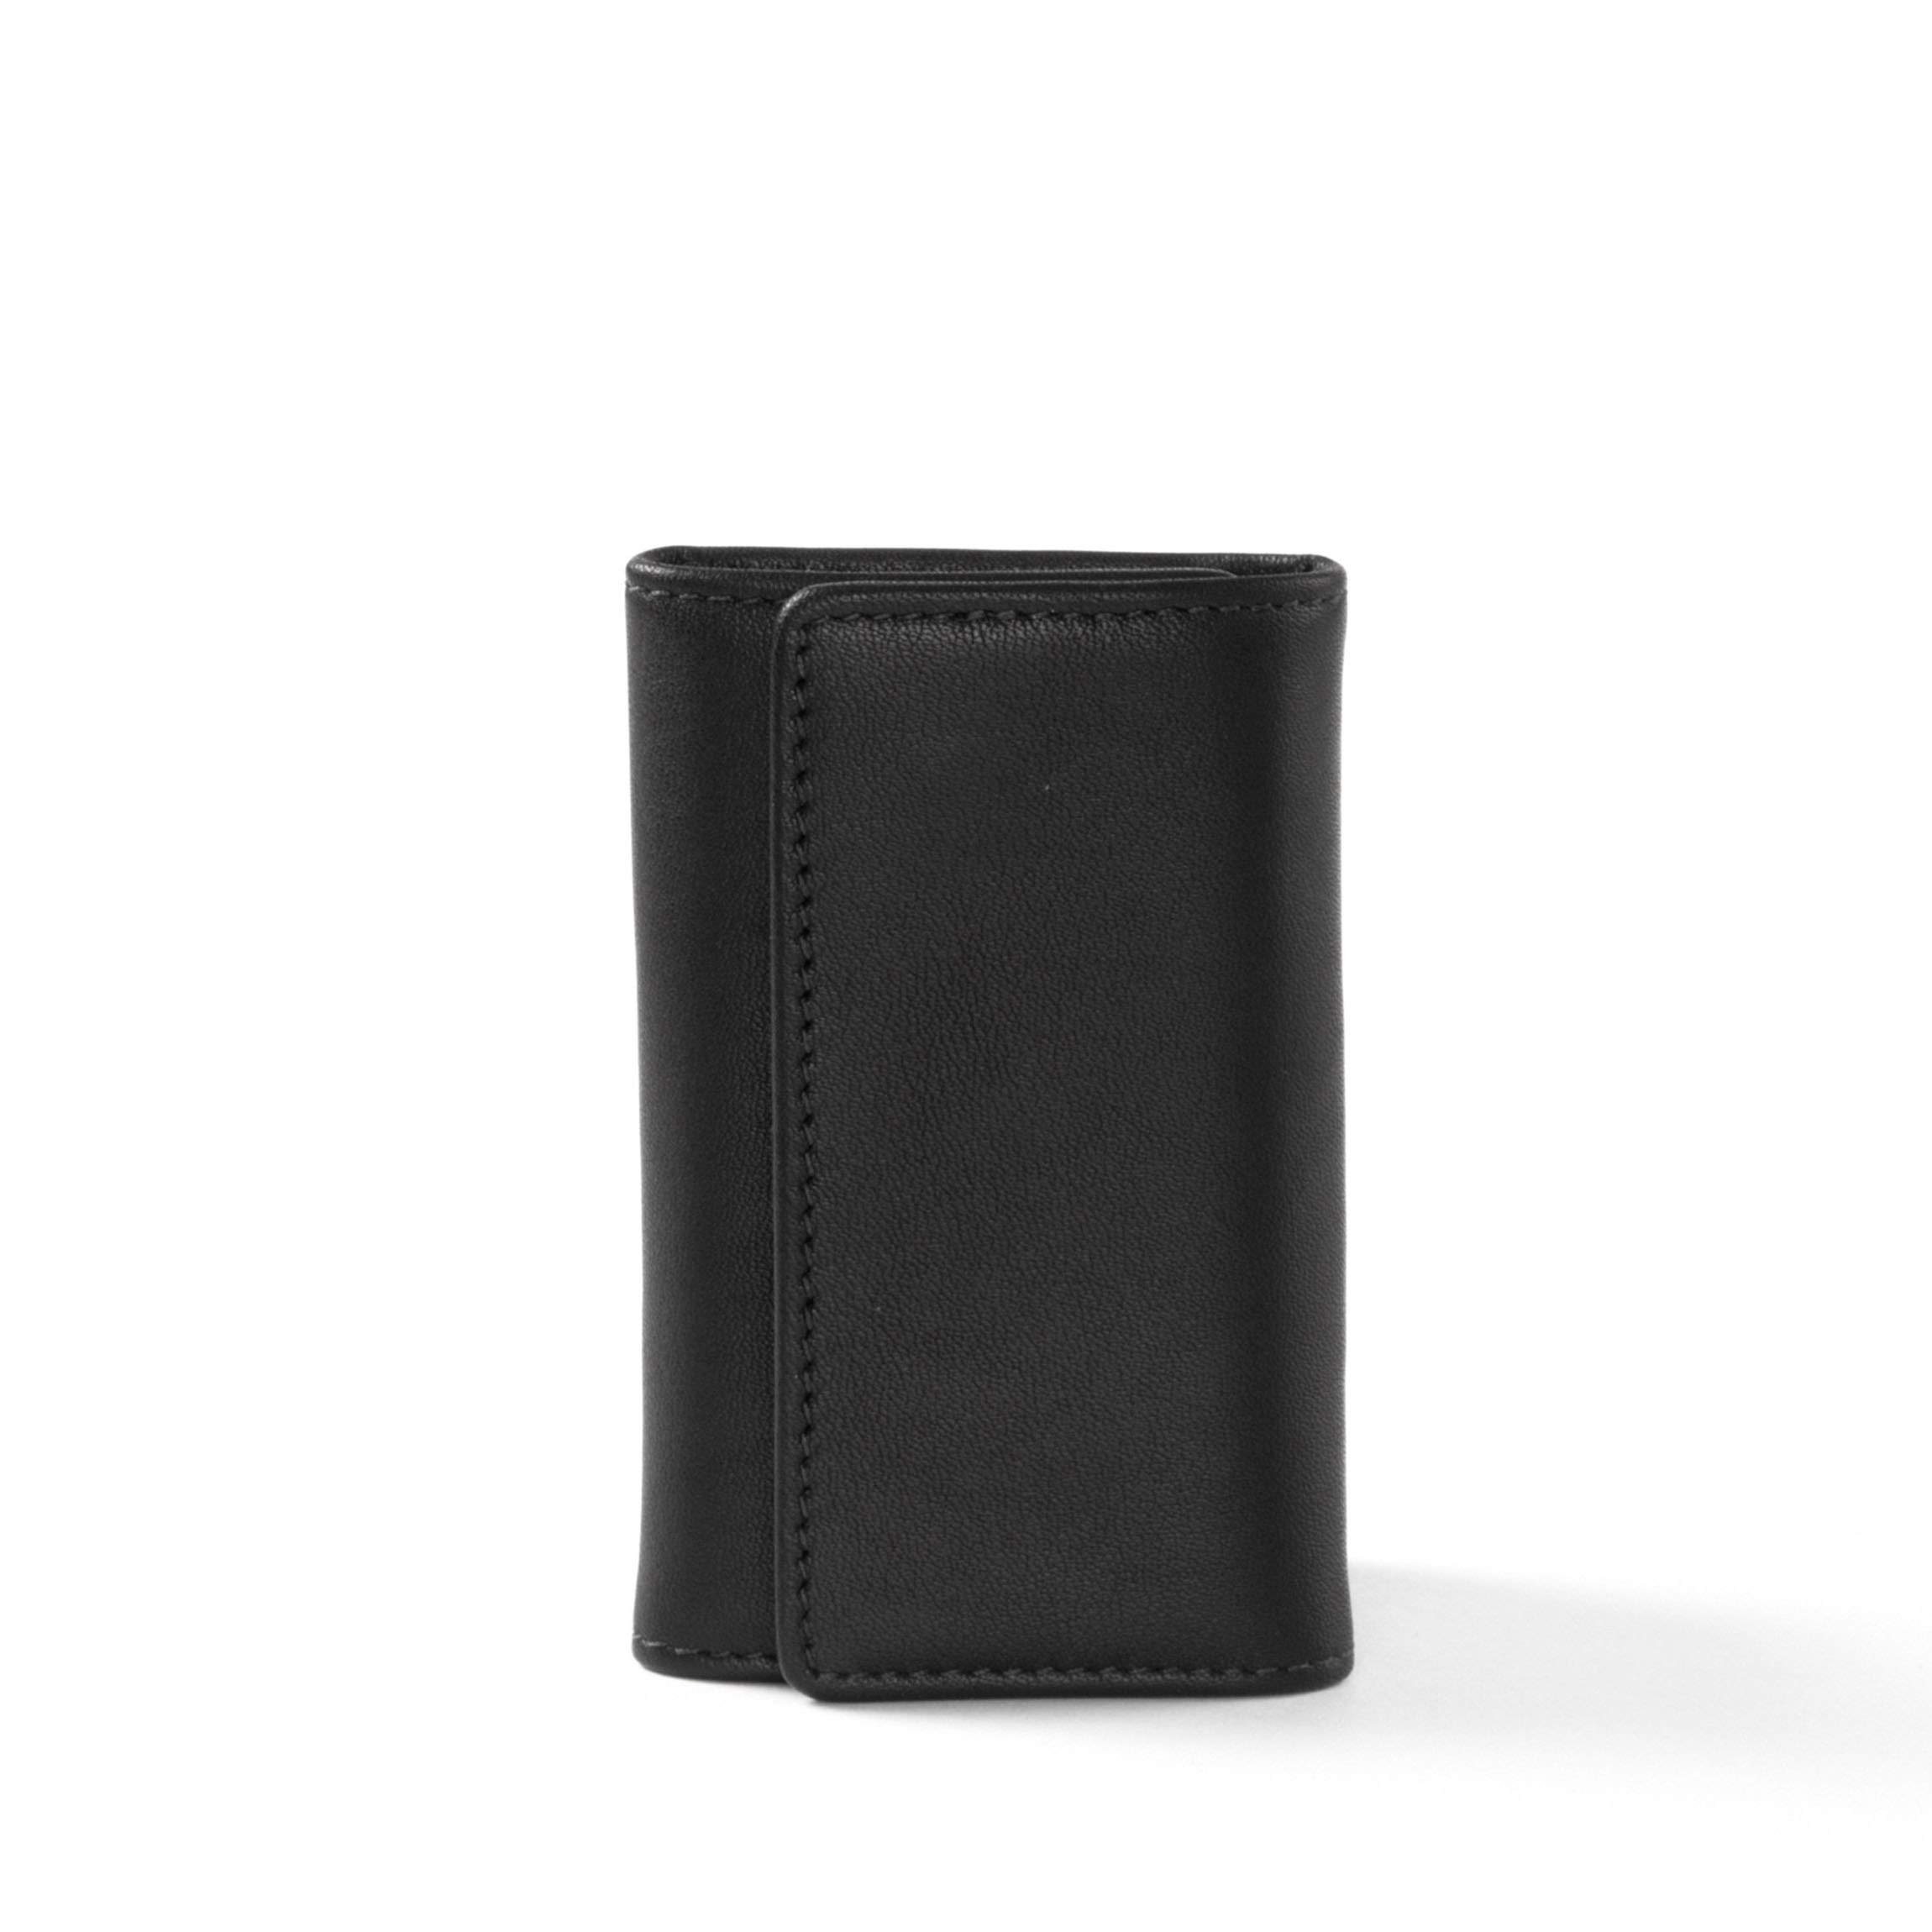 Key Case - Full Grain Leather - Black Onyx (black)